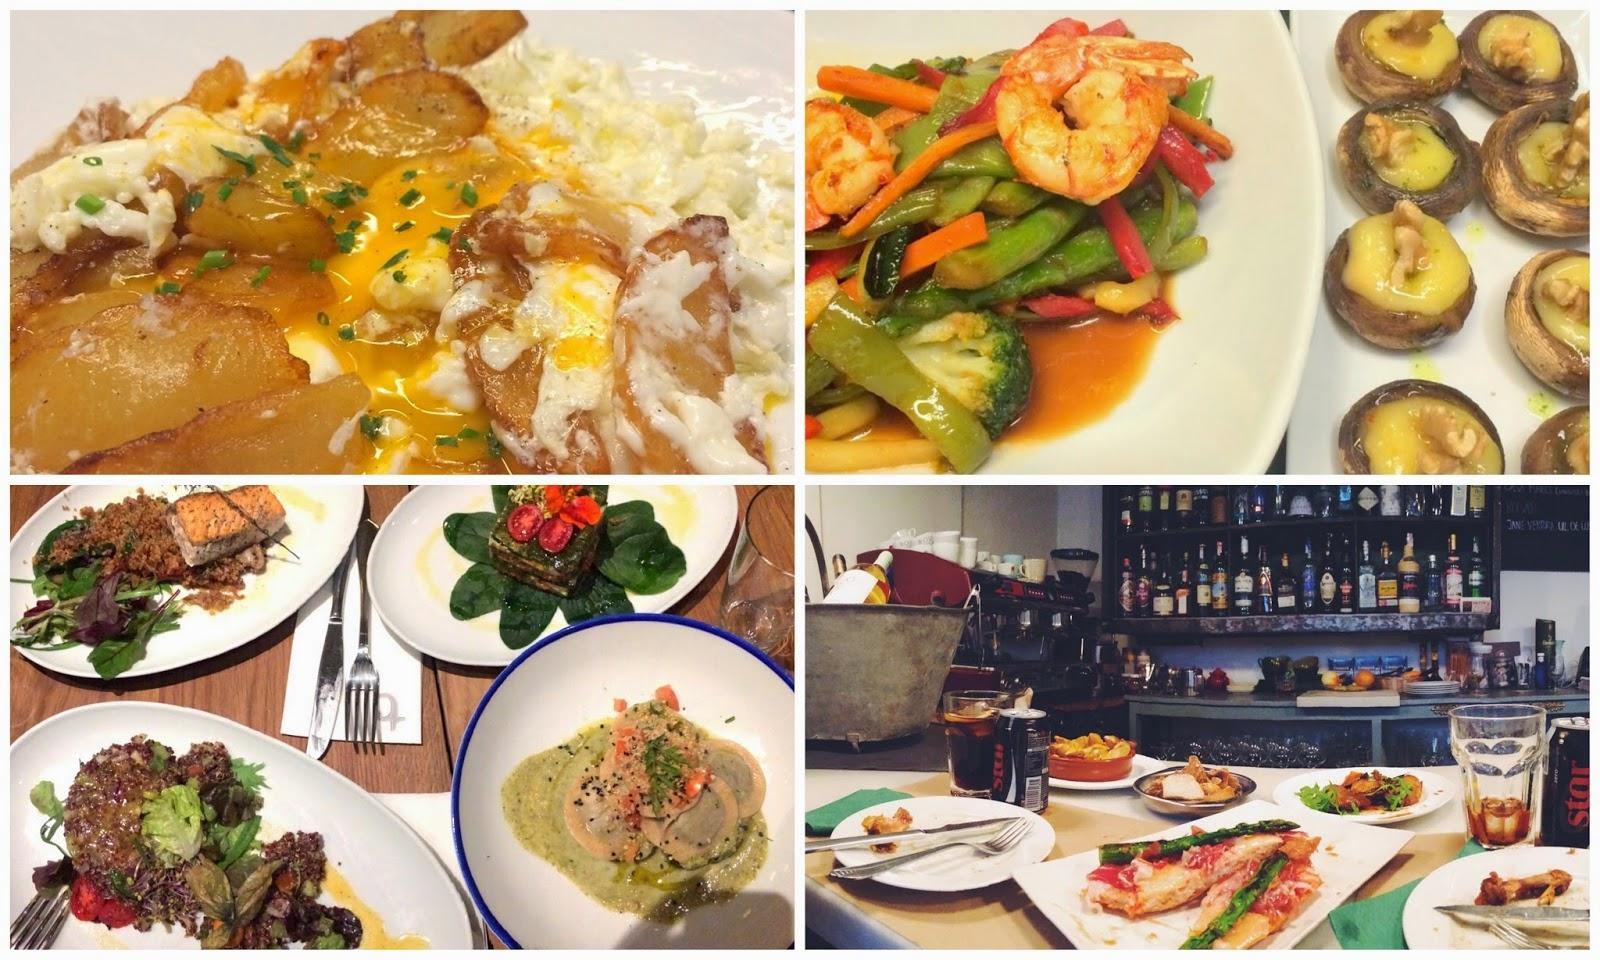 comida restaurantes patatas verduras gambas pan comer cenar barcelona bodegueta provença flax&kale tarambana barcelona mágica bcn